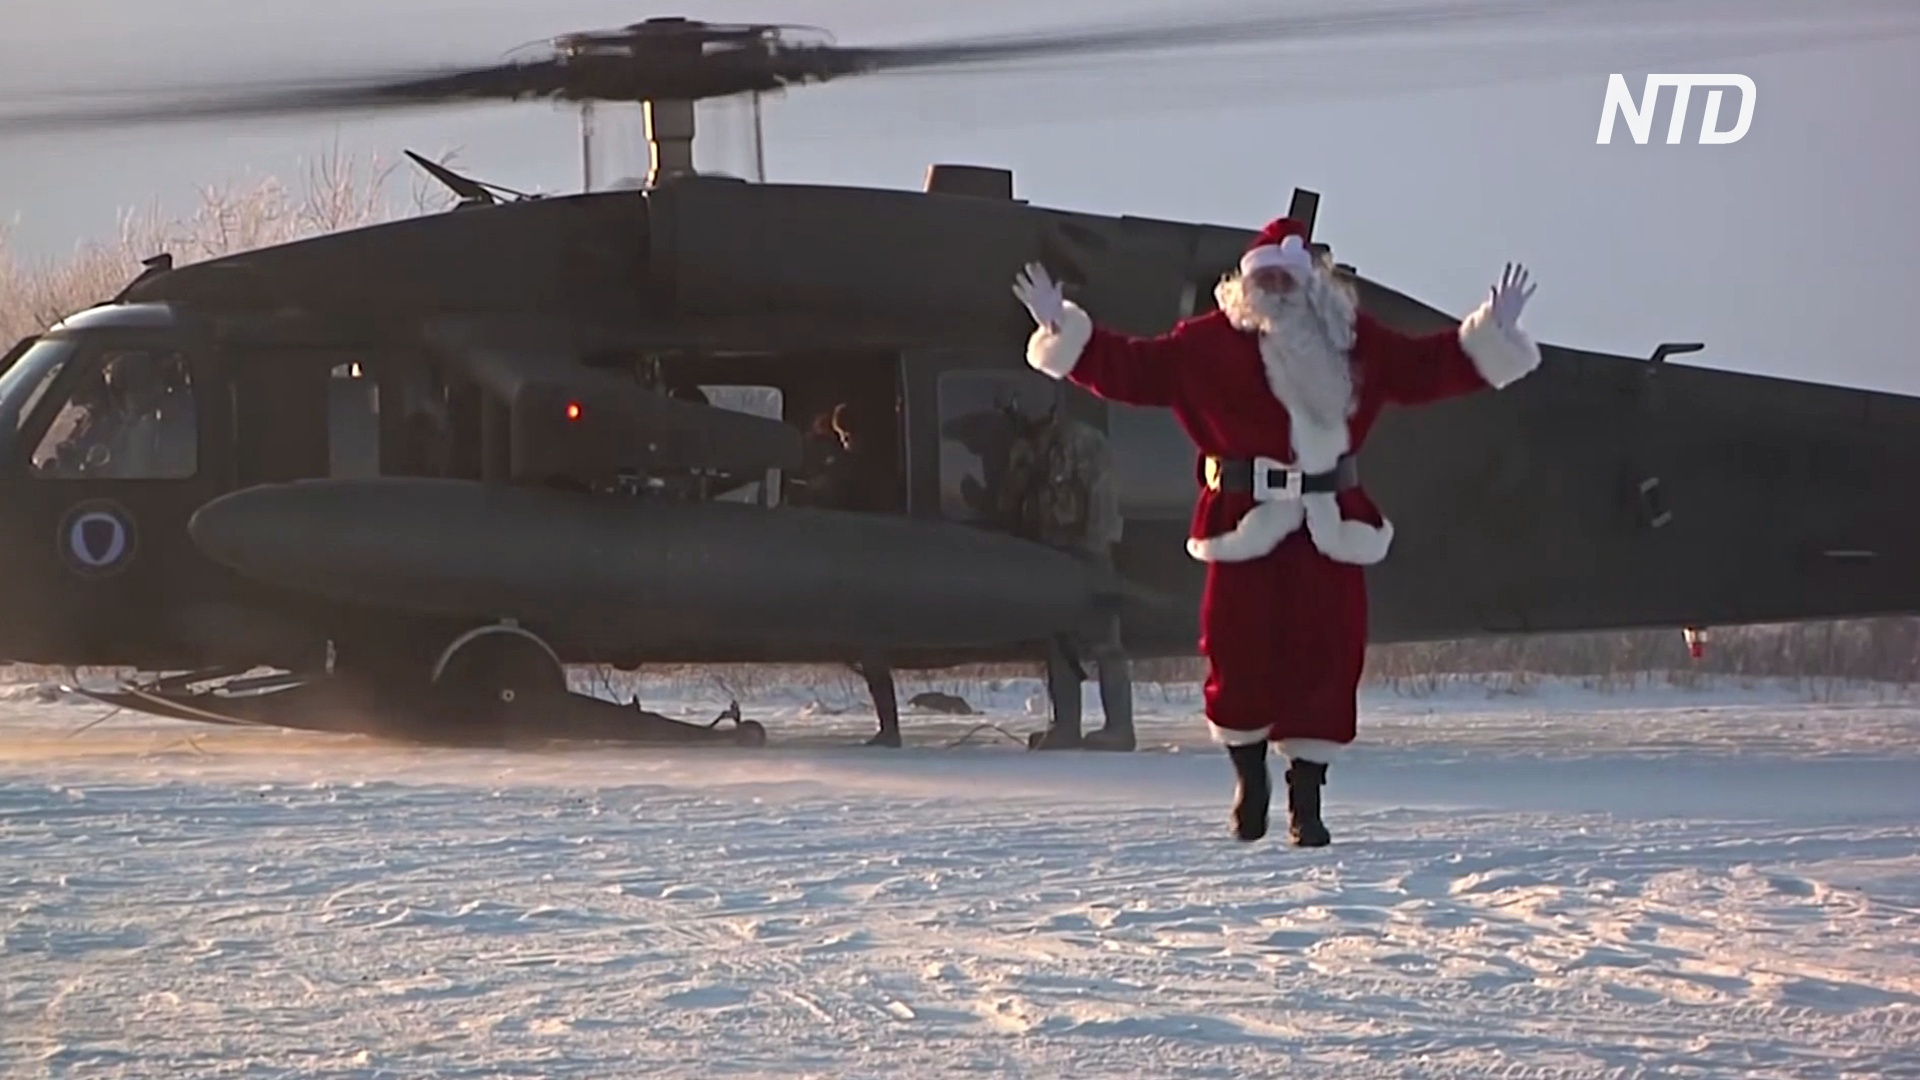 ВВС США привезли Санта-Клауса в отдалённую деревню Аляски